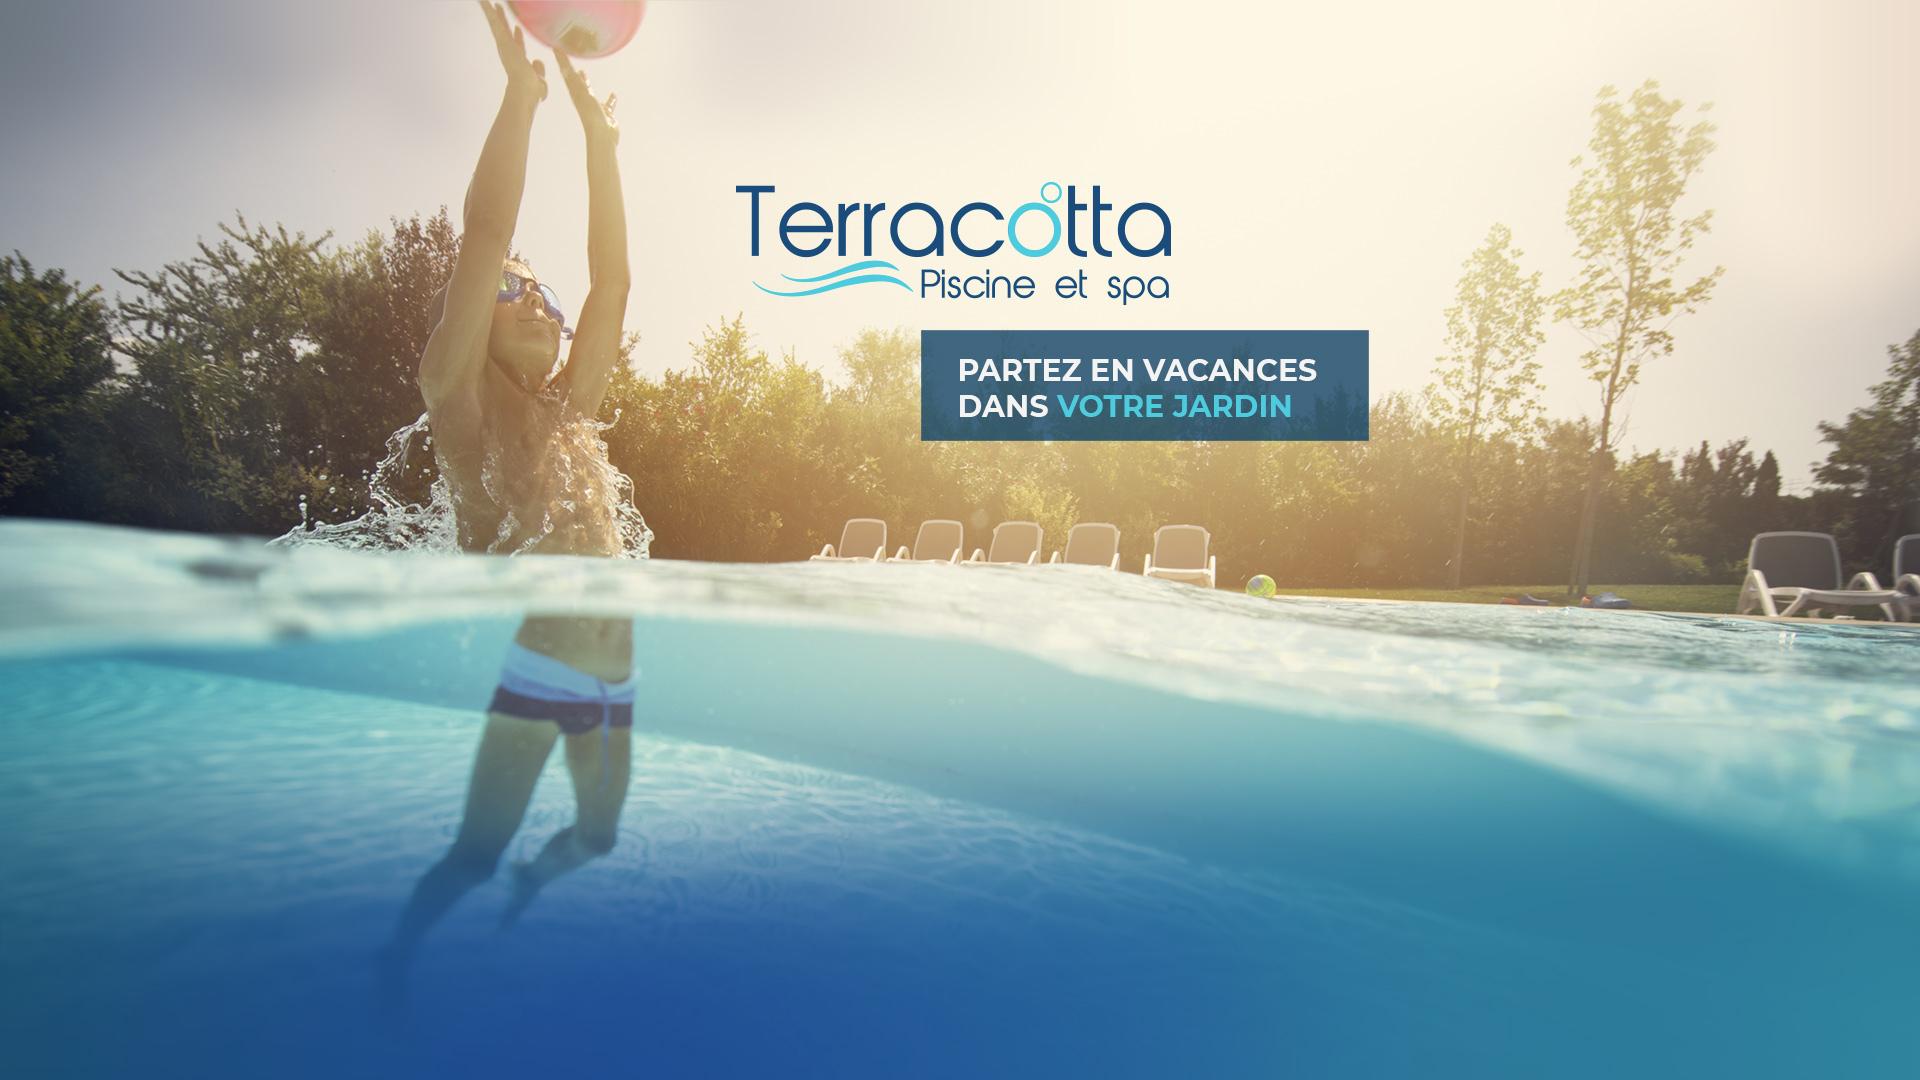 Terracotta Piscines Spas, Vente Construction Piscine Et Spa ... avec Horaire Piscine Morlaix